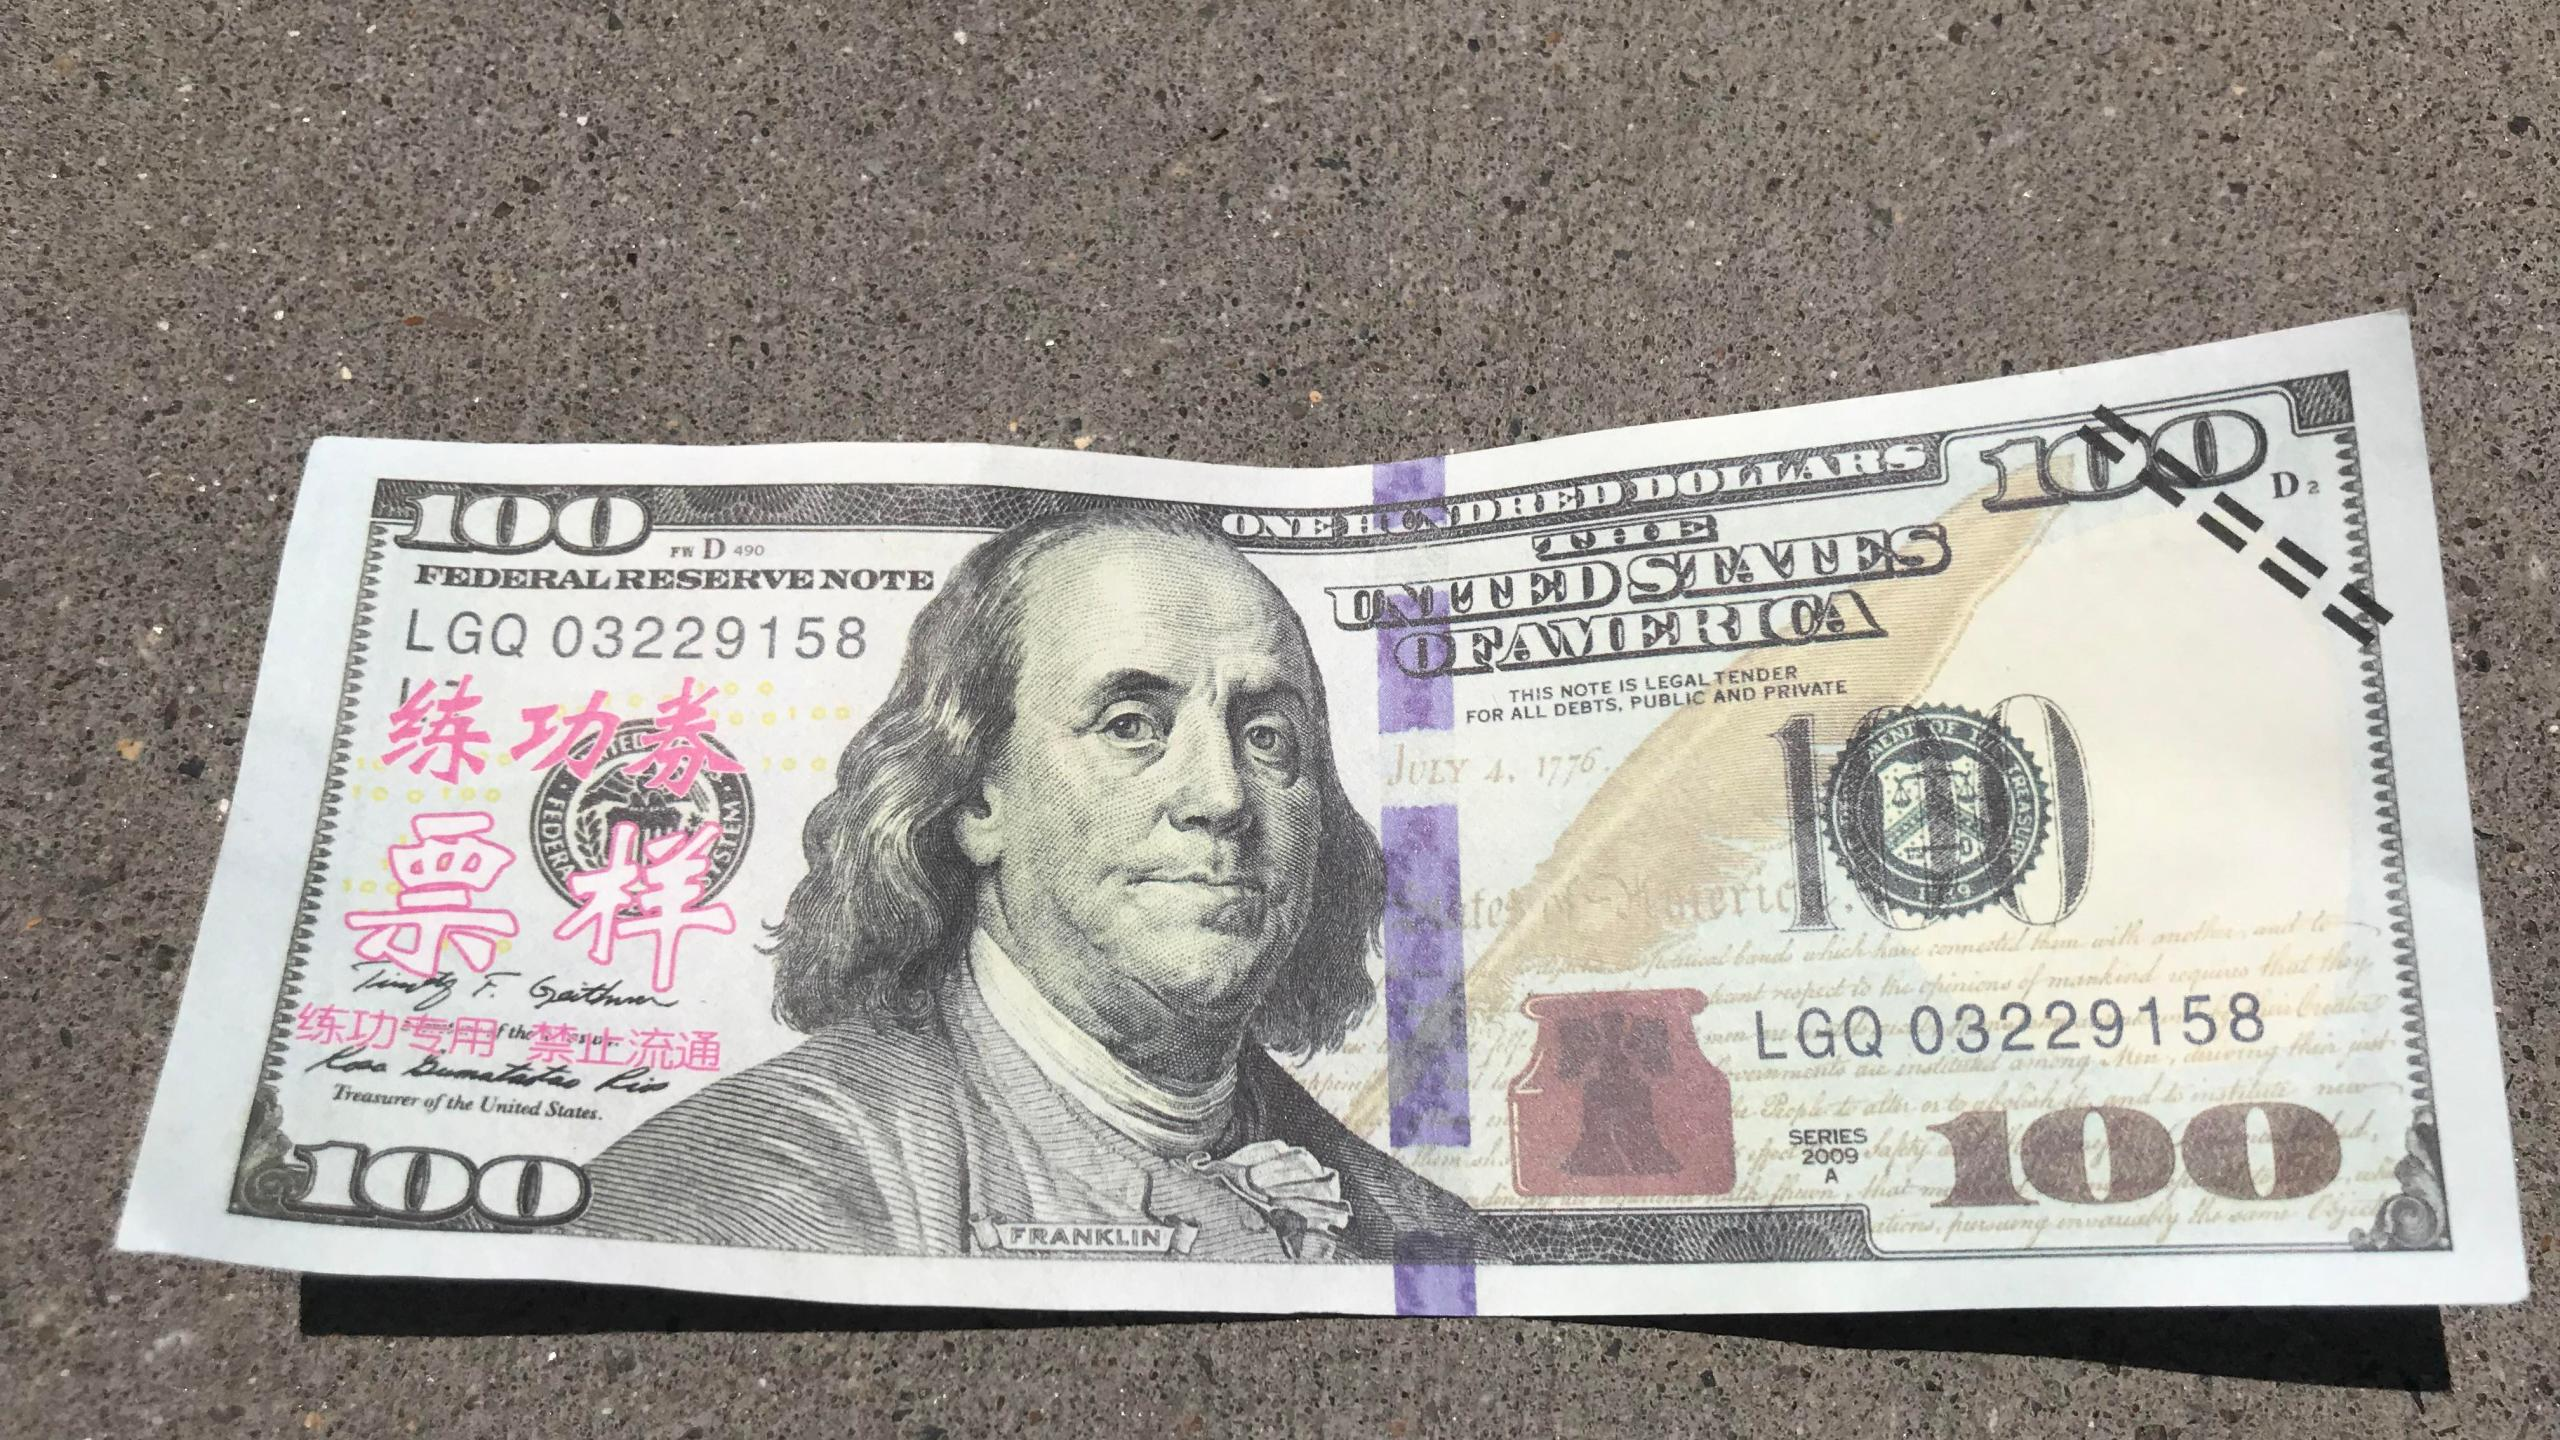 Counterfeit photo 1_1559095033685.jpg.jpg